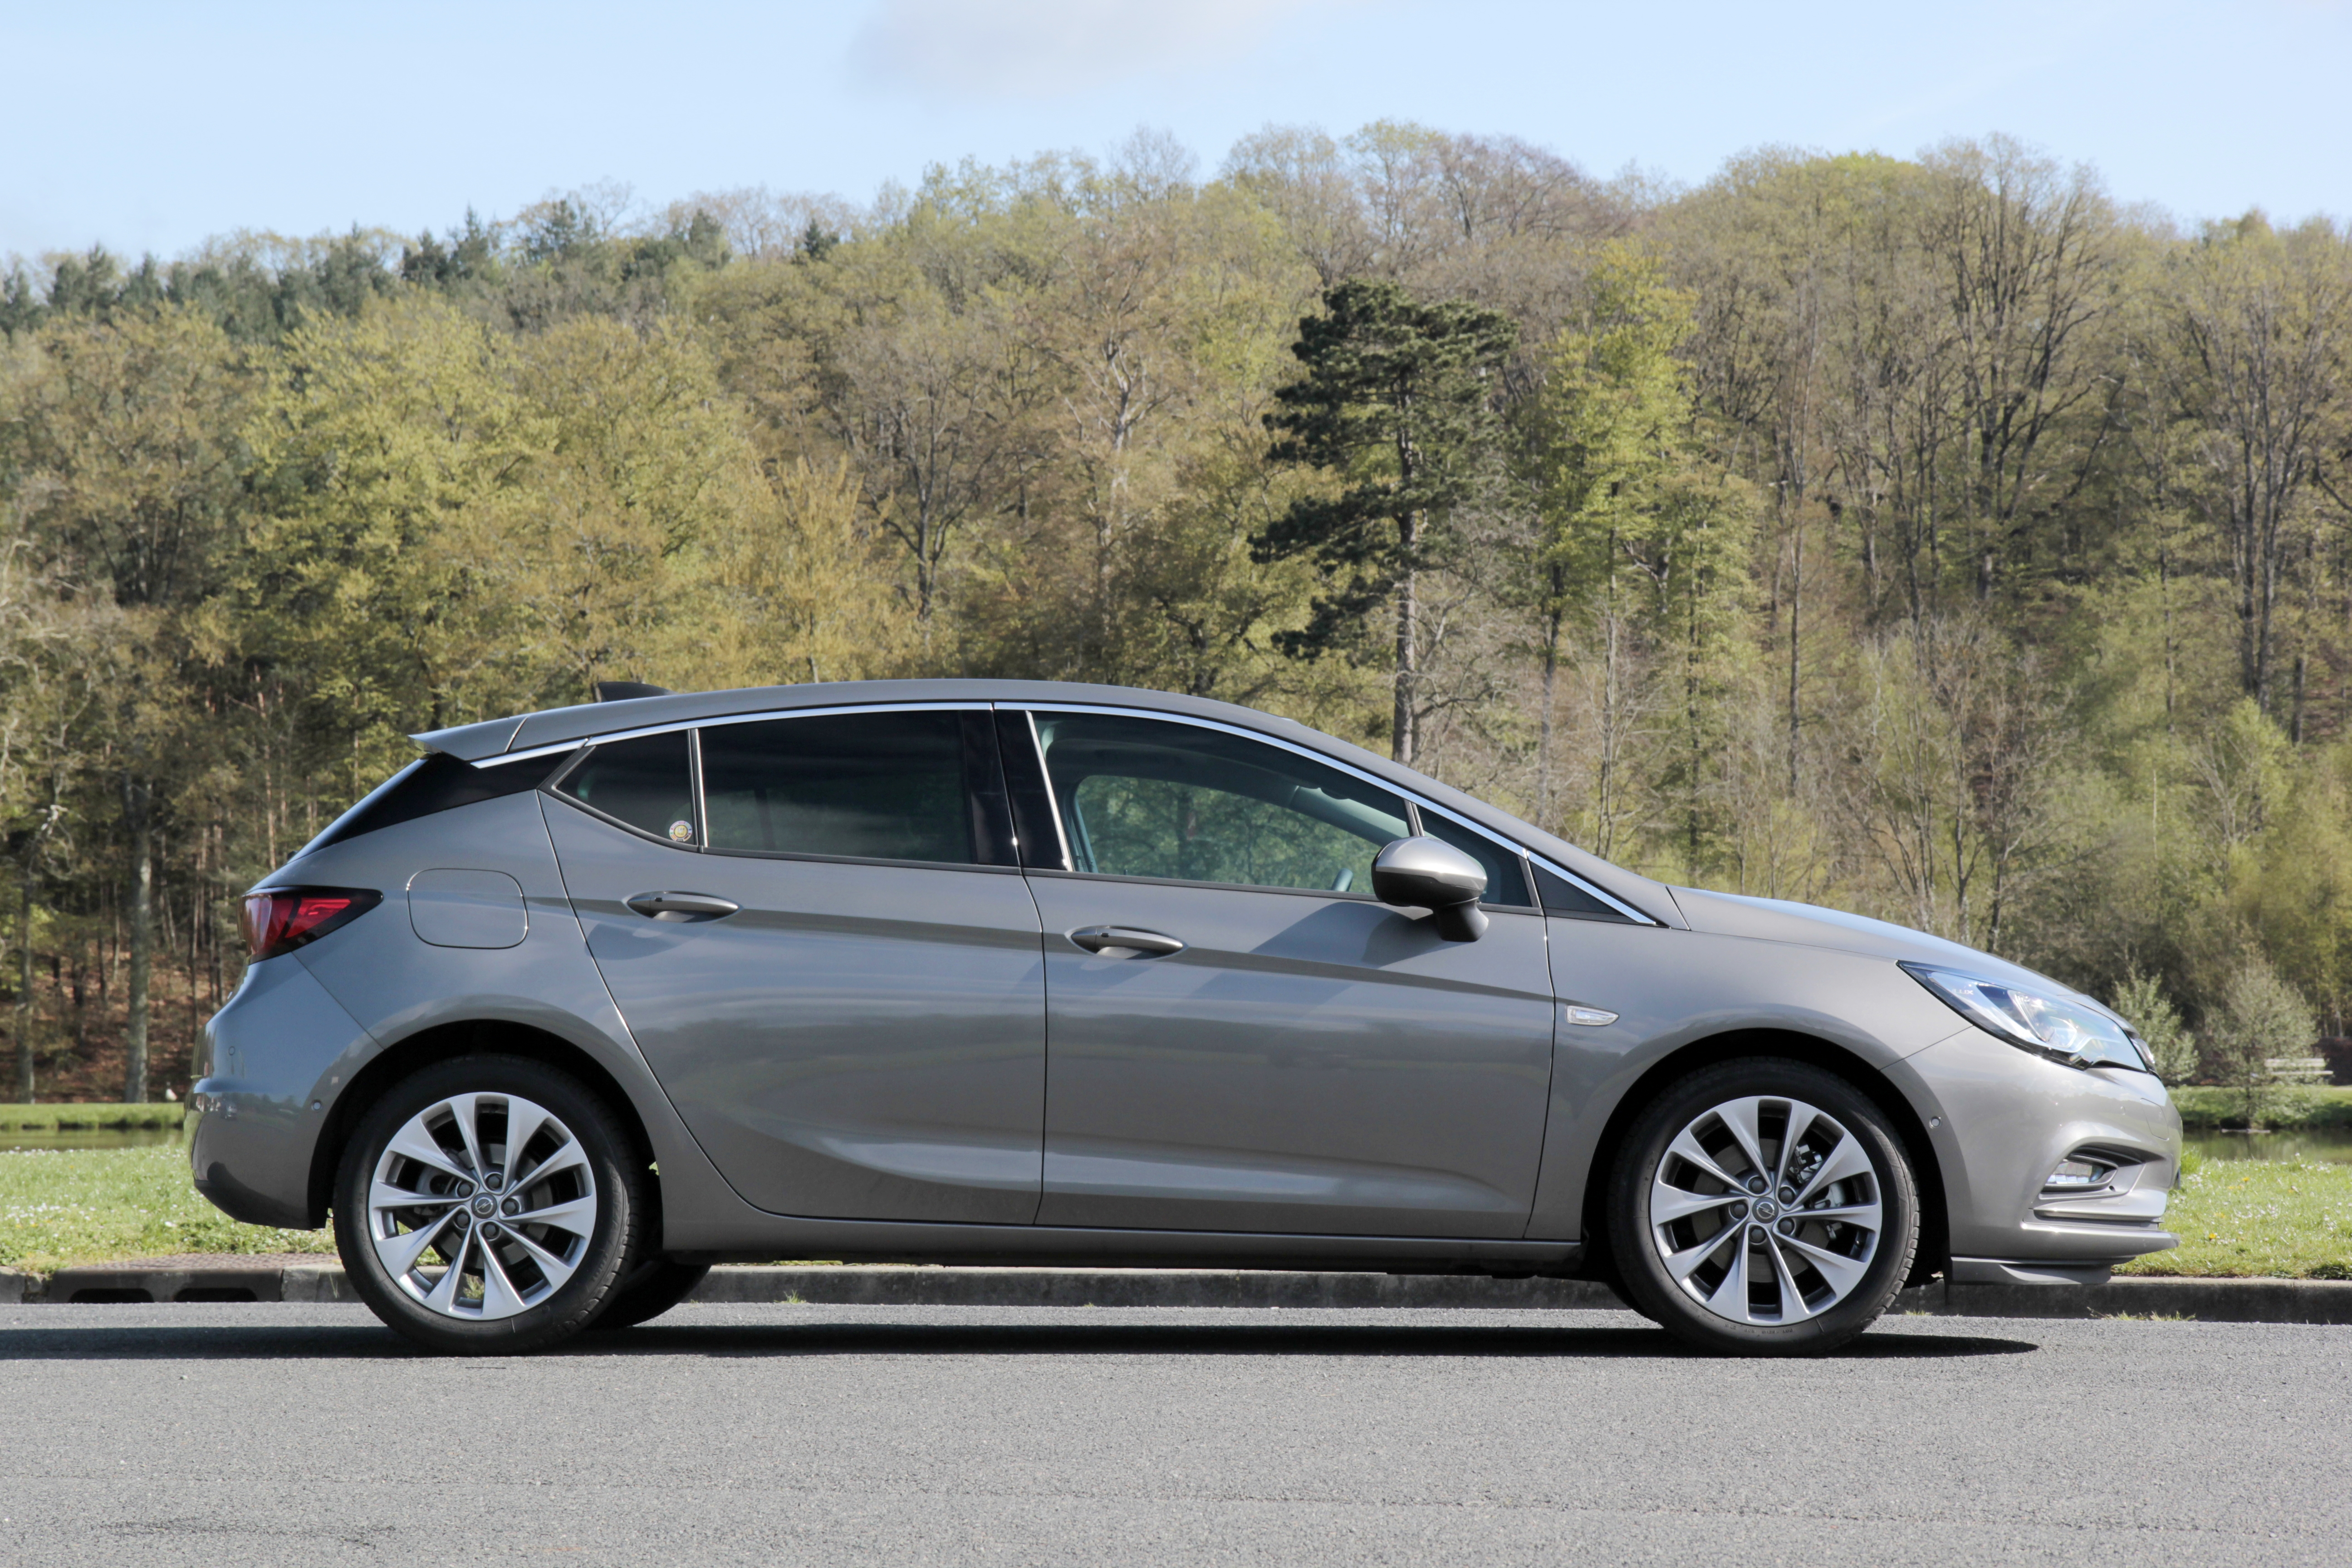 Comparativa: Opel Astra VS Renault Megane VS Volkswagen Golf  S0-comparatif-video-renault-megane-vs-opel-astra-vs-volkswagen-golf-la-deuxieme-tentative-sera-t-elle-la-bonne-378200